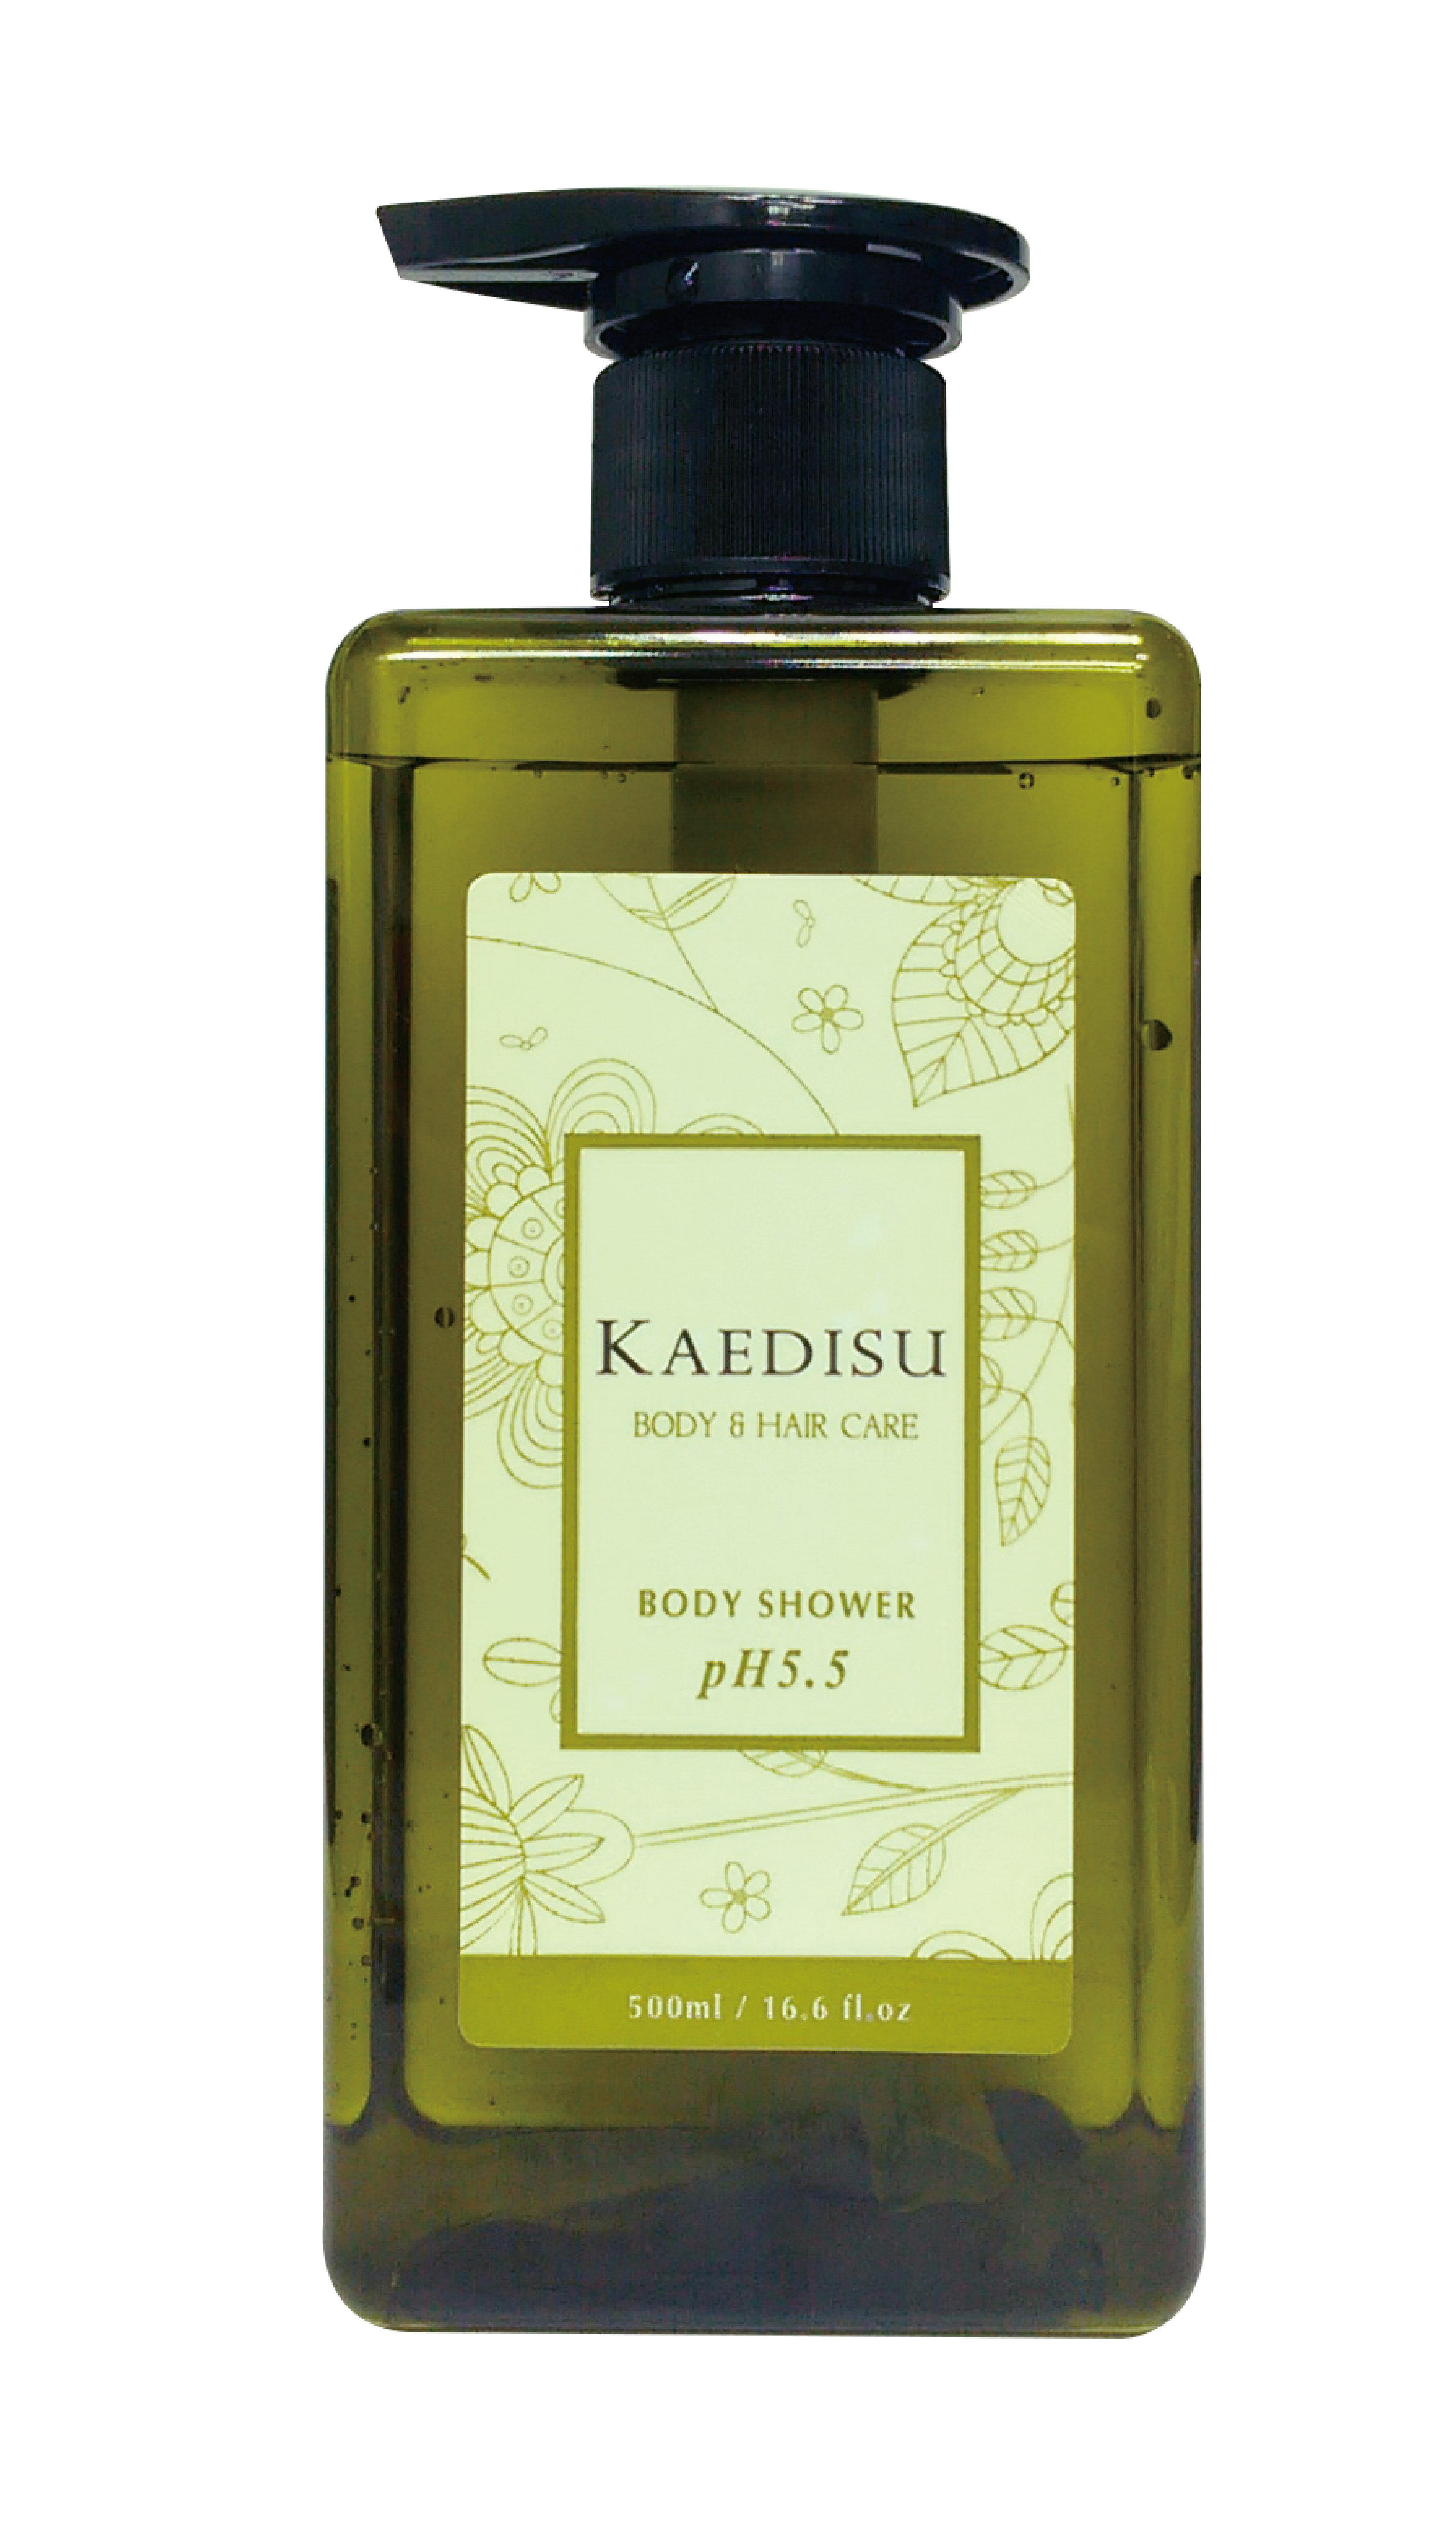 KAEDISU凱帝舒 晶鑽沐浴精露 PH5.5 精美旅用試用20ml 1包 約可使用1~2日